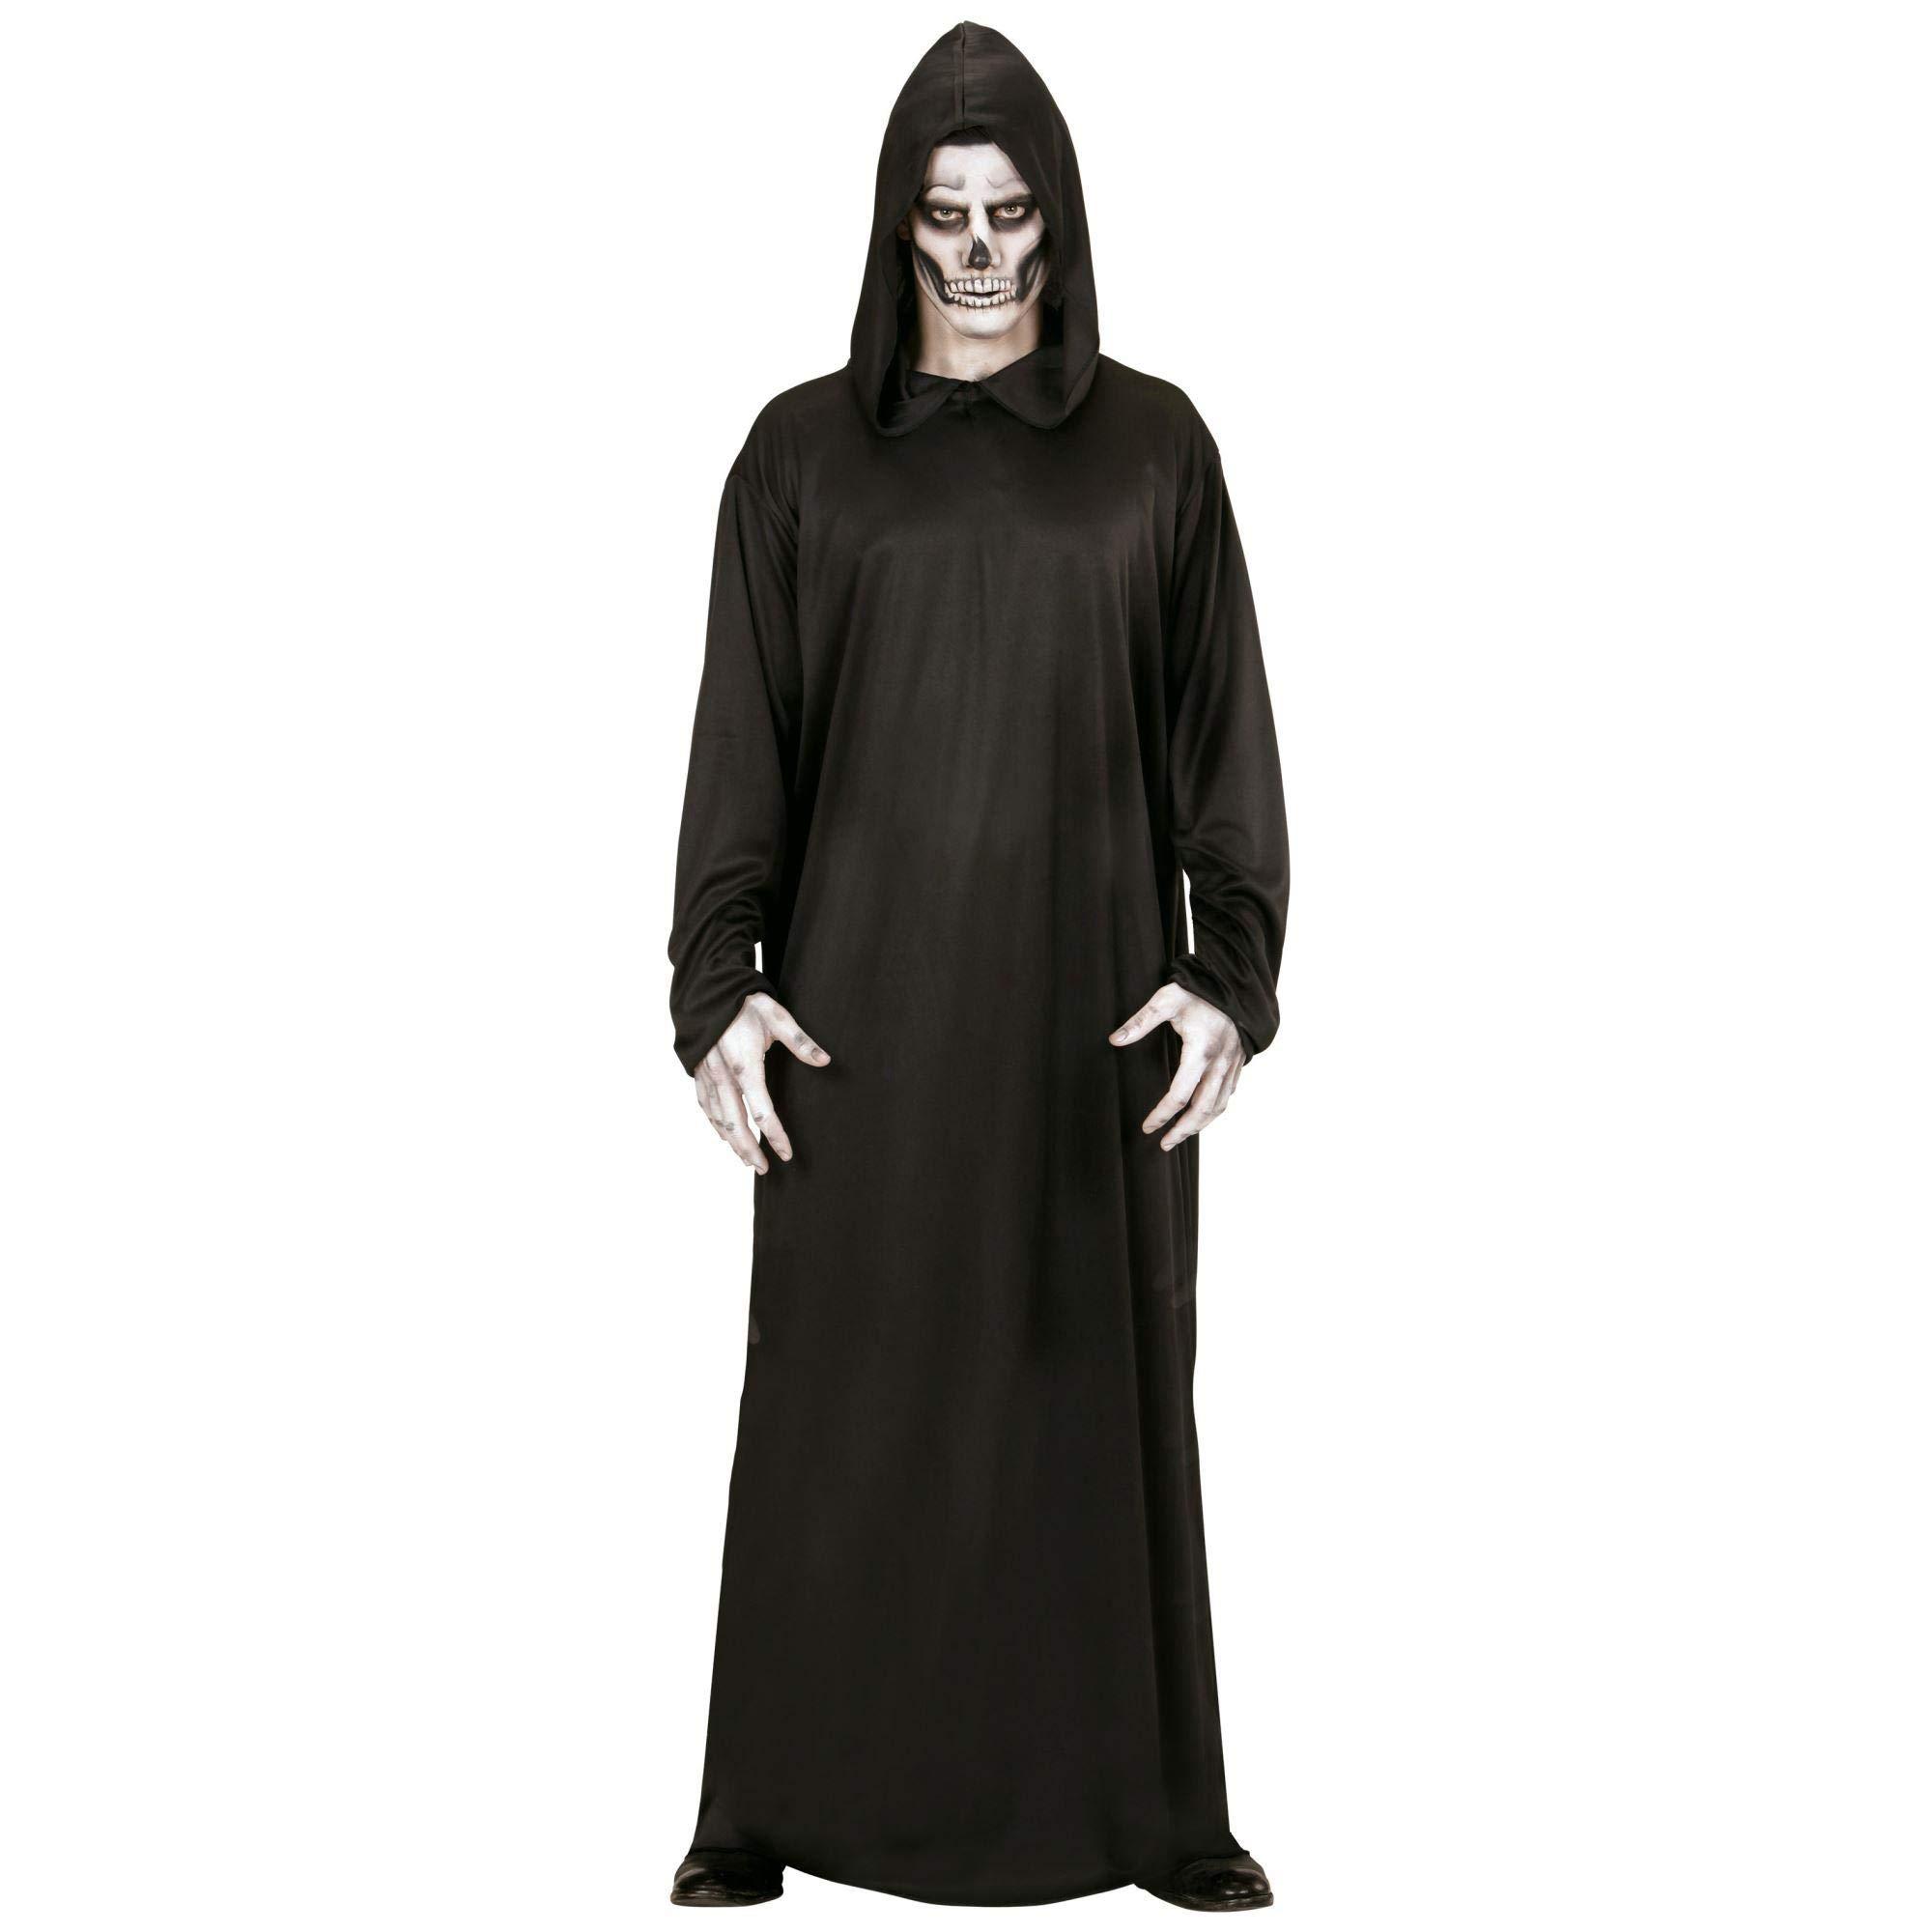 WIDMANN- Traje muerte vestido con capucha, Color negro, L (00013 ...